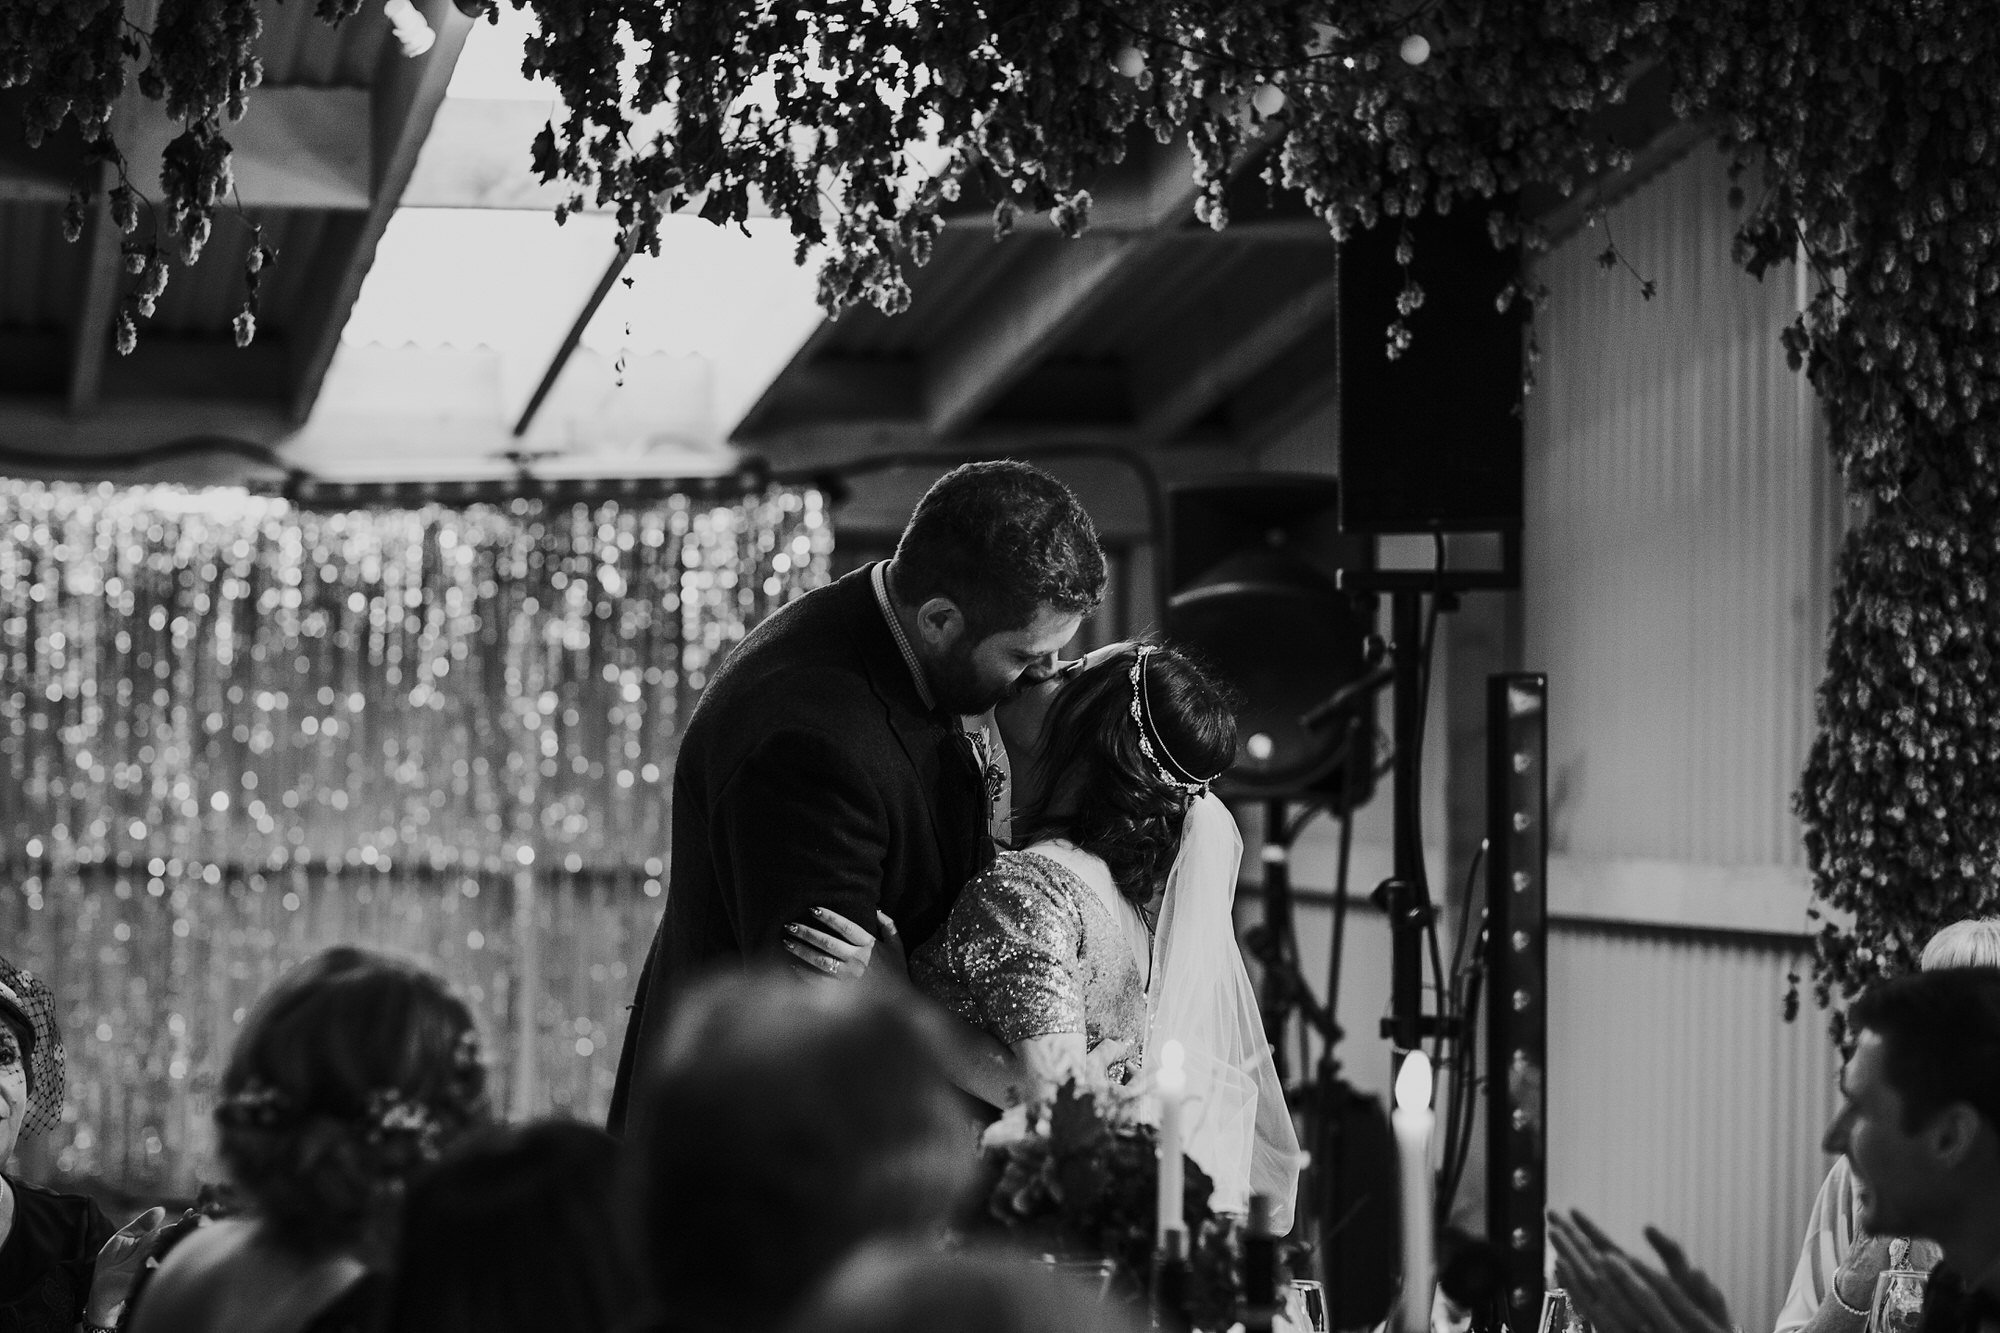 067 TIN SHED KNOCKRAICH FARM WEDDING ALTERNATIVE BRIDE ZOE ALEXANDRA PHOTOGRAPHY